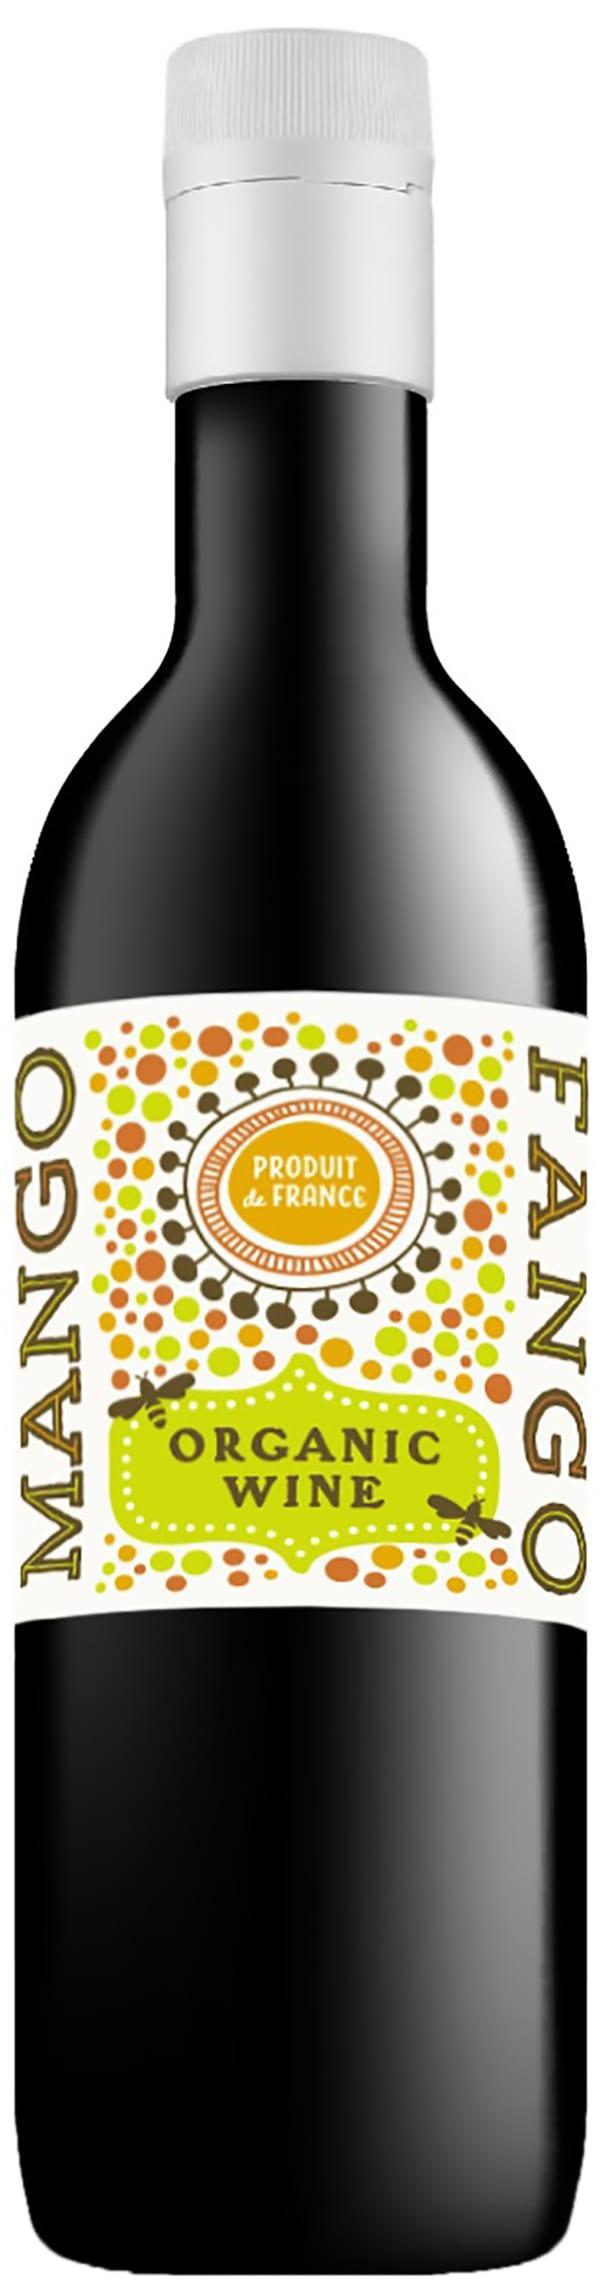 Mango Fango Grenache Syrah Organic 2016 plastic bottle